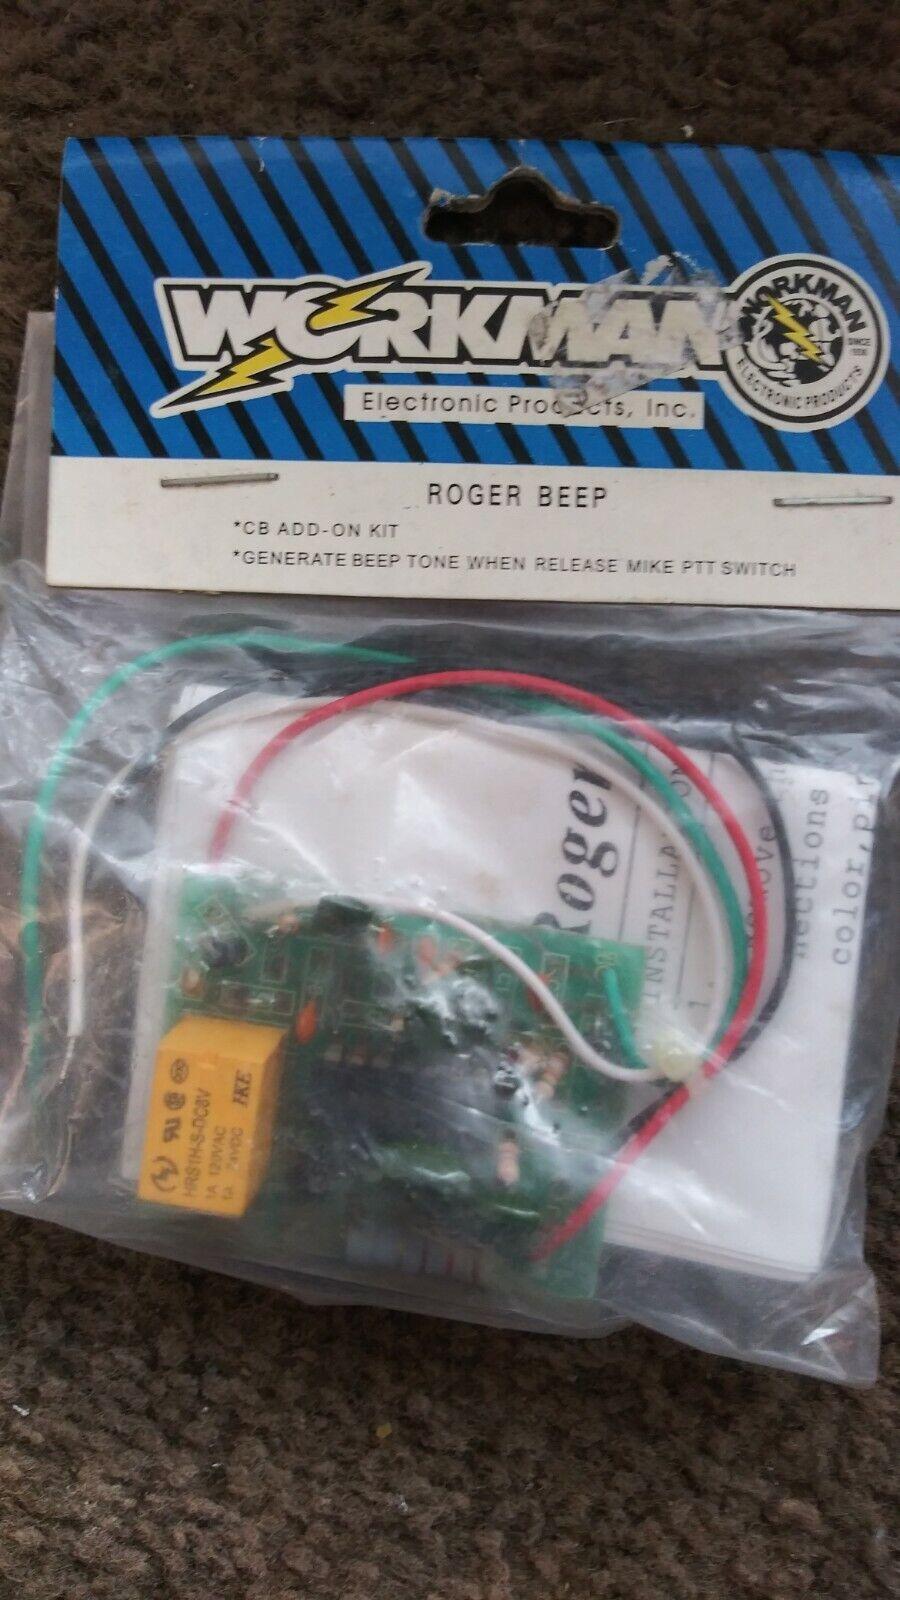 Workman Roger Beep  Board for CB Radios